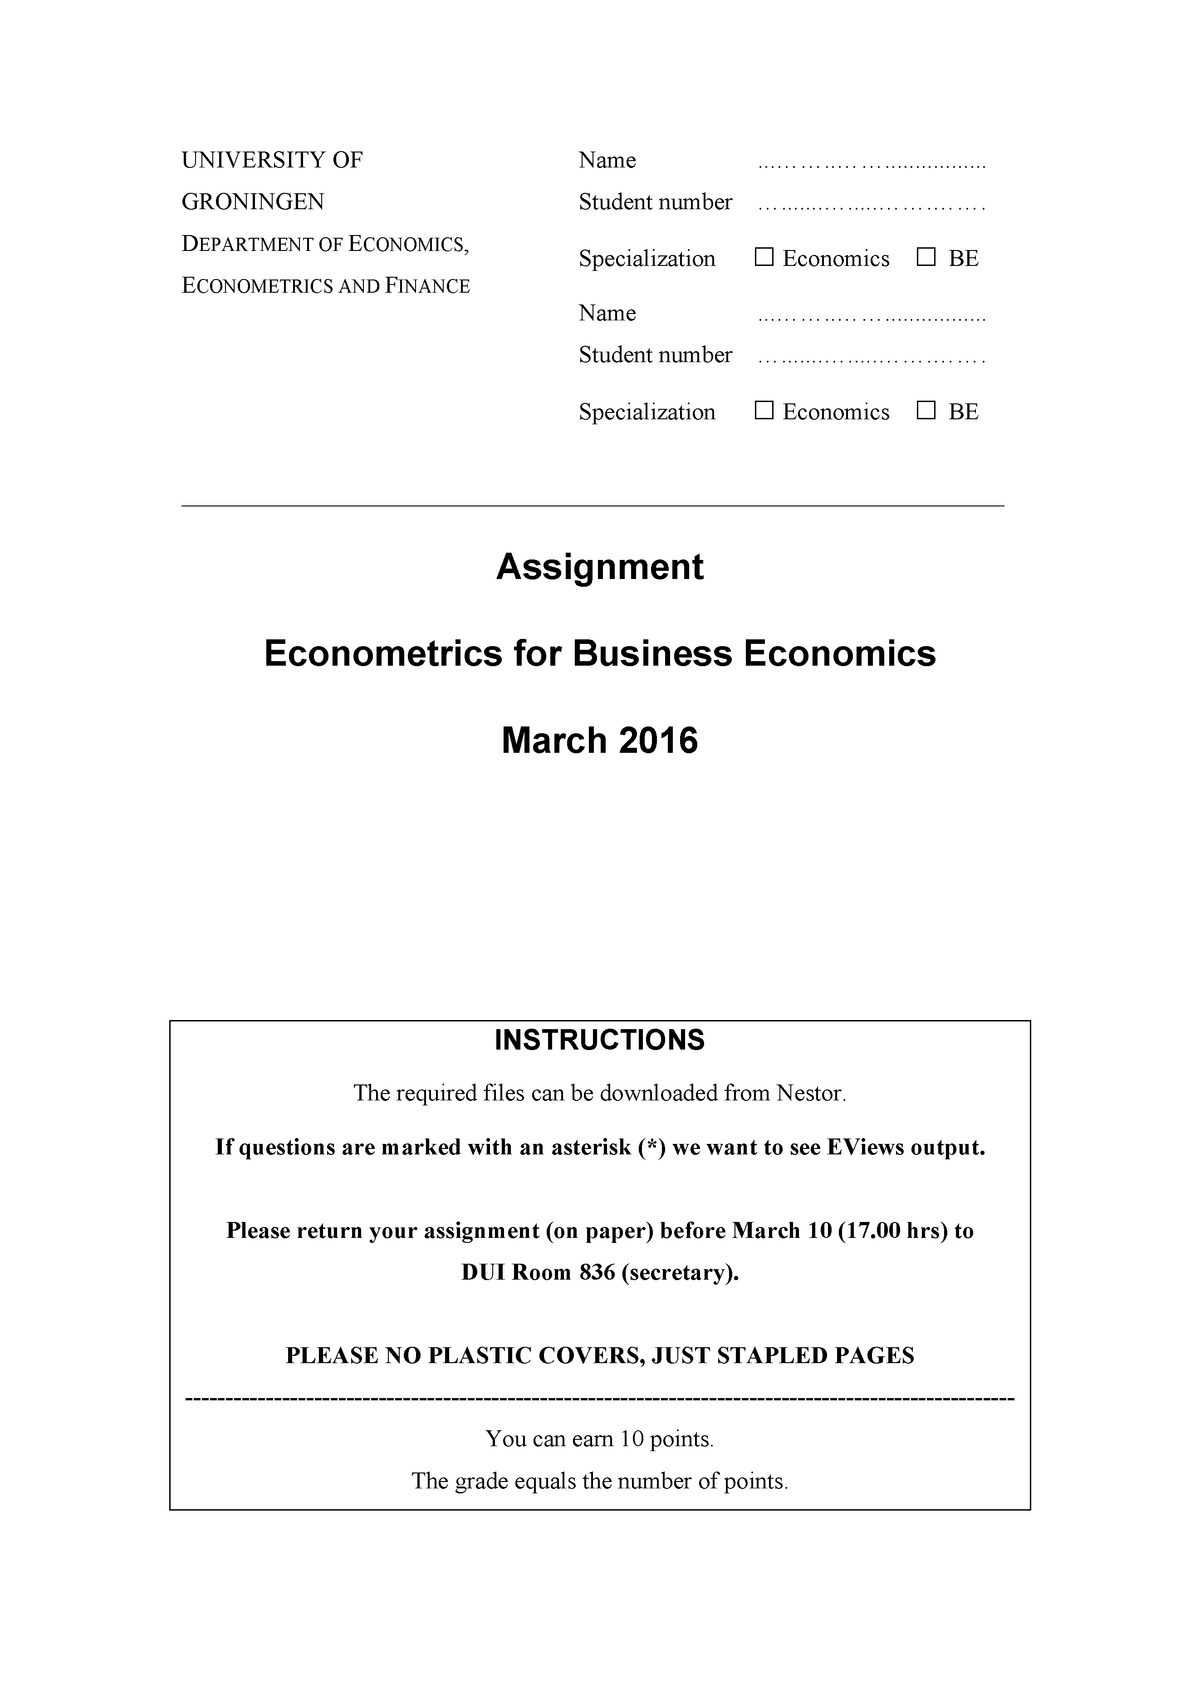 Practicum - Econometrics for Business Economics - EBB814A05